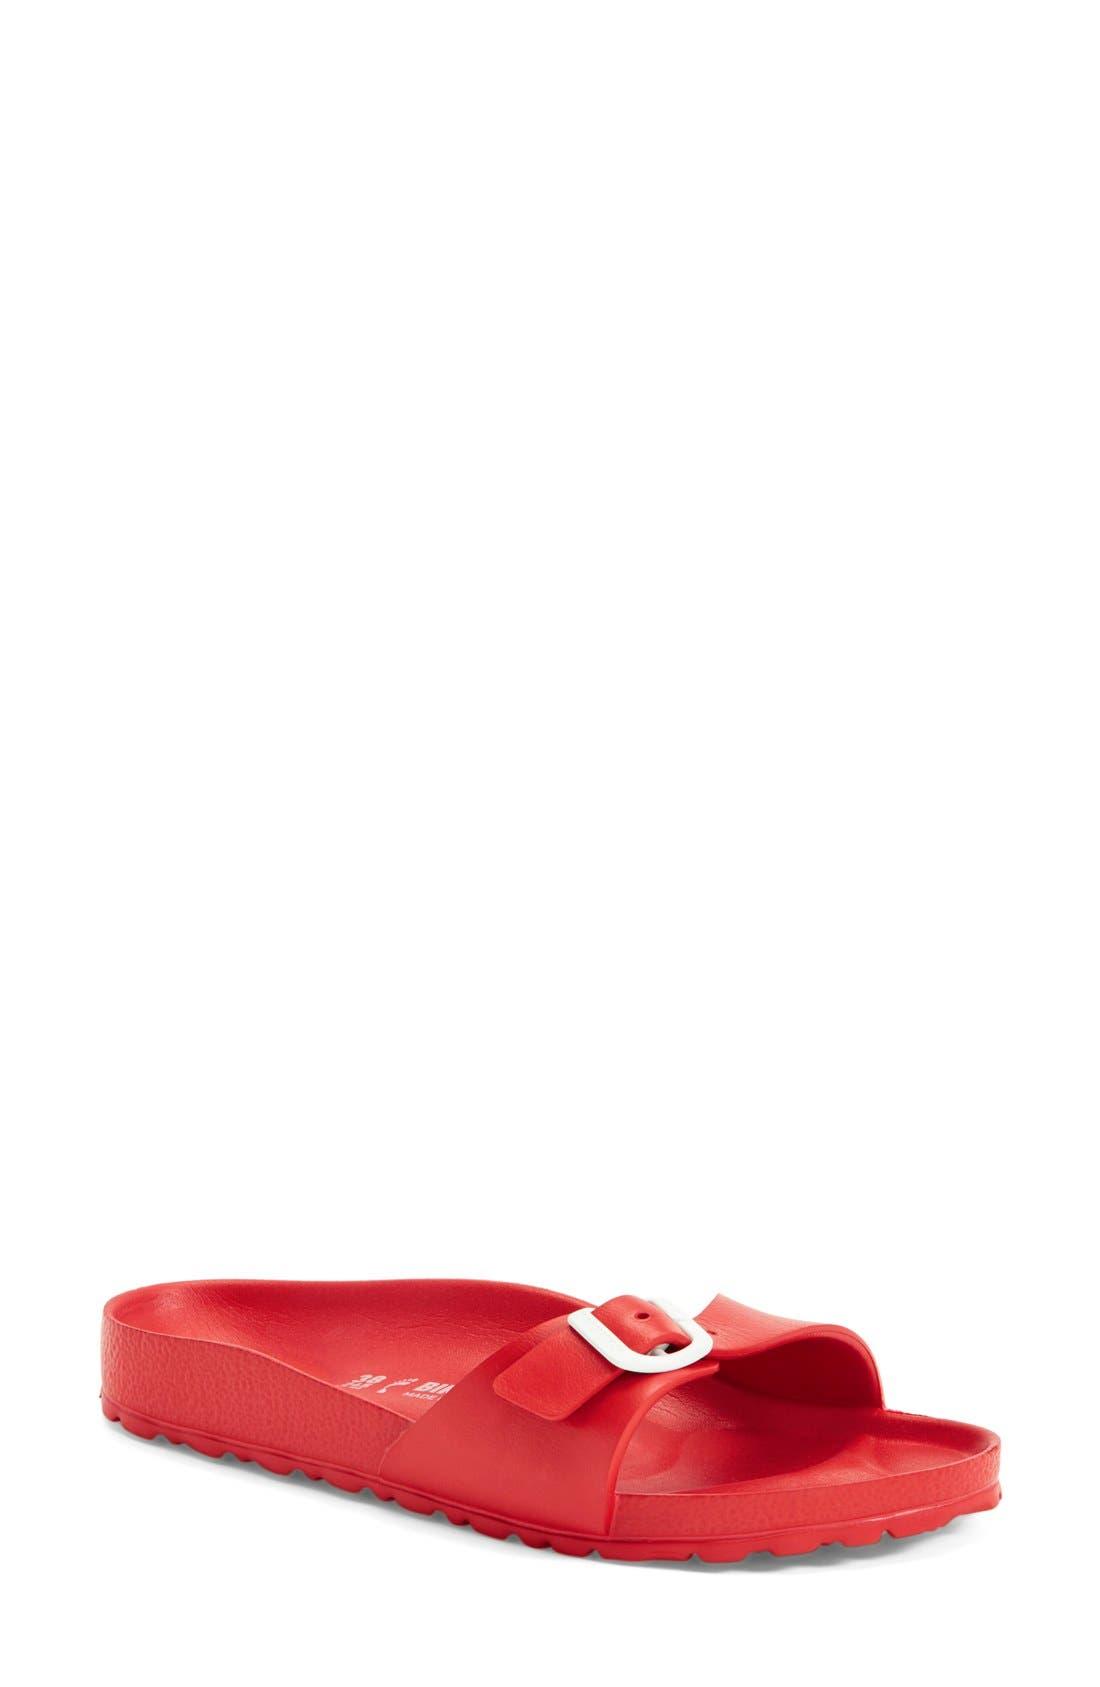 'Essentials - Madrid' Slide Sandal,                             Main thumbnail 7, color,